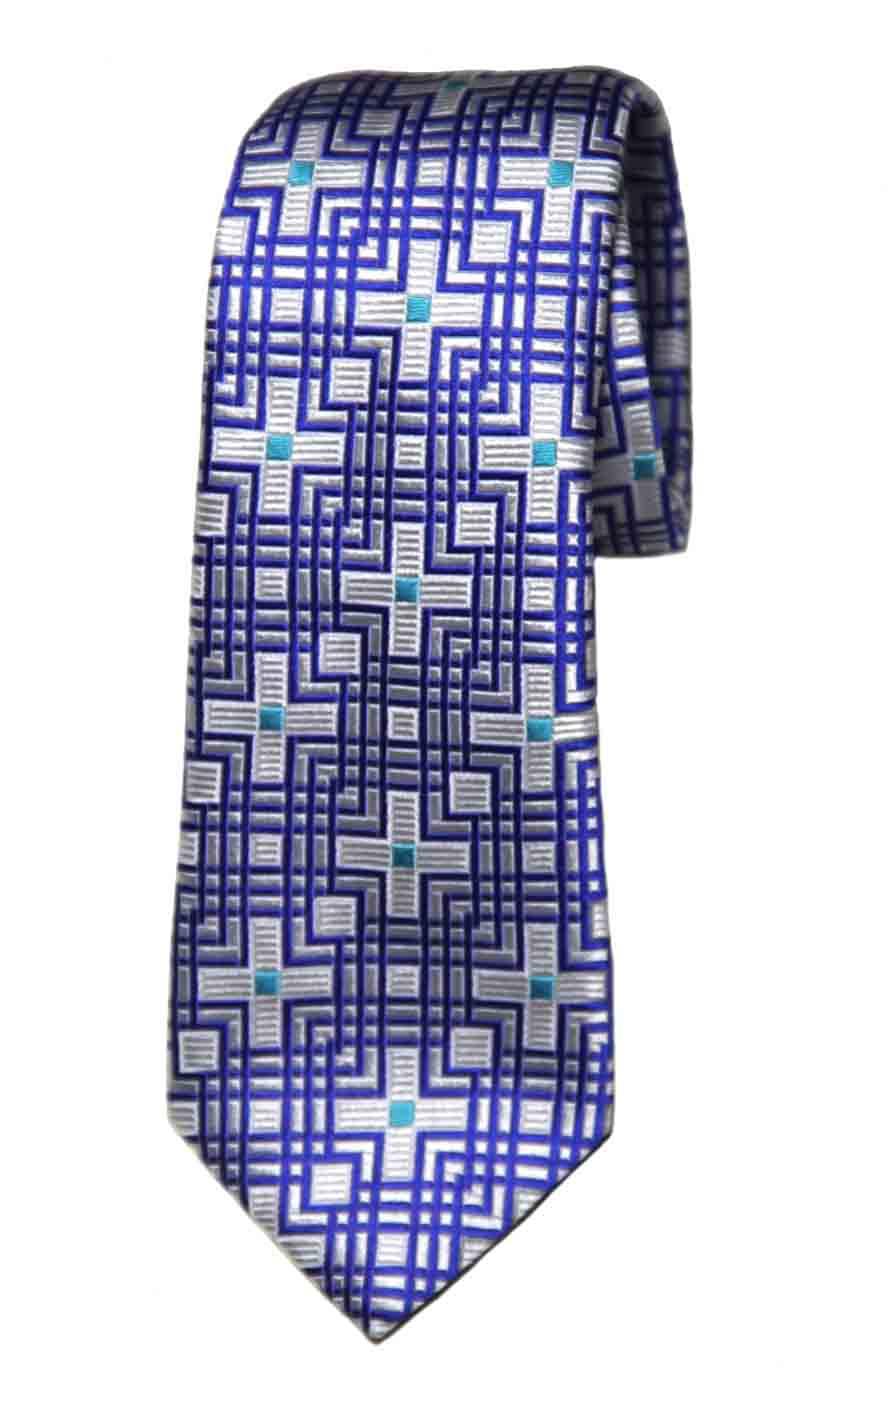 Penrose English Silk Tie Navy Blue Teal White Geometric Charing B Men's